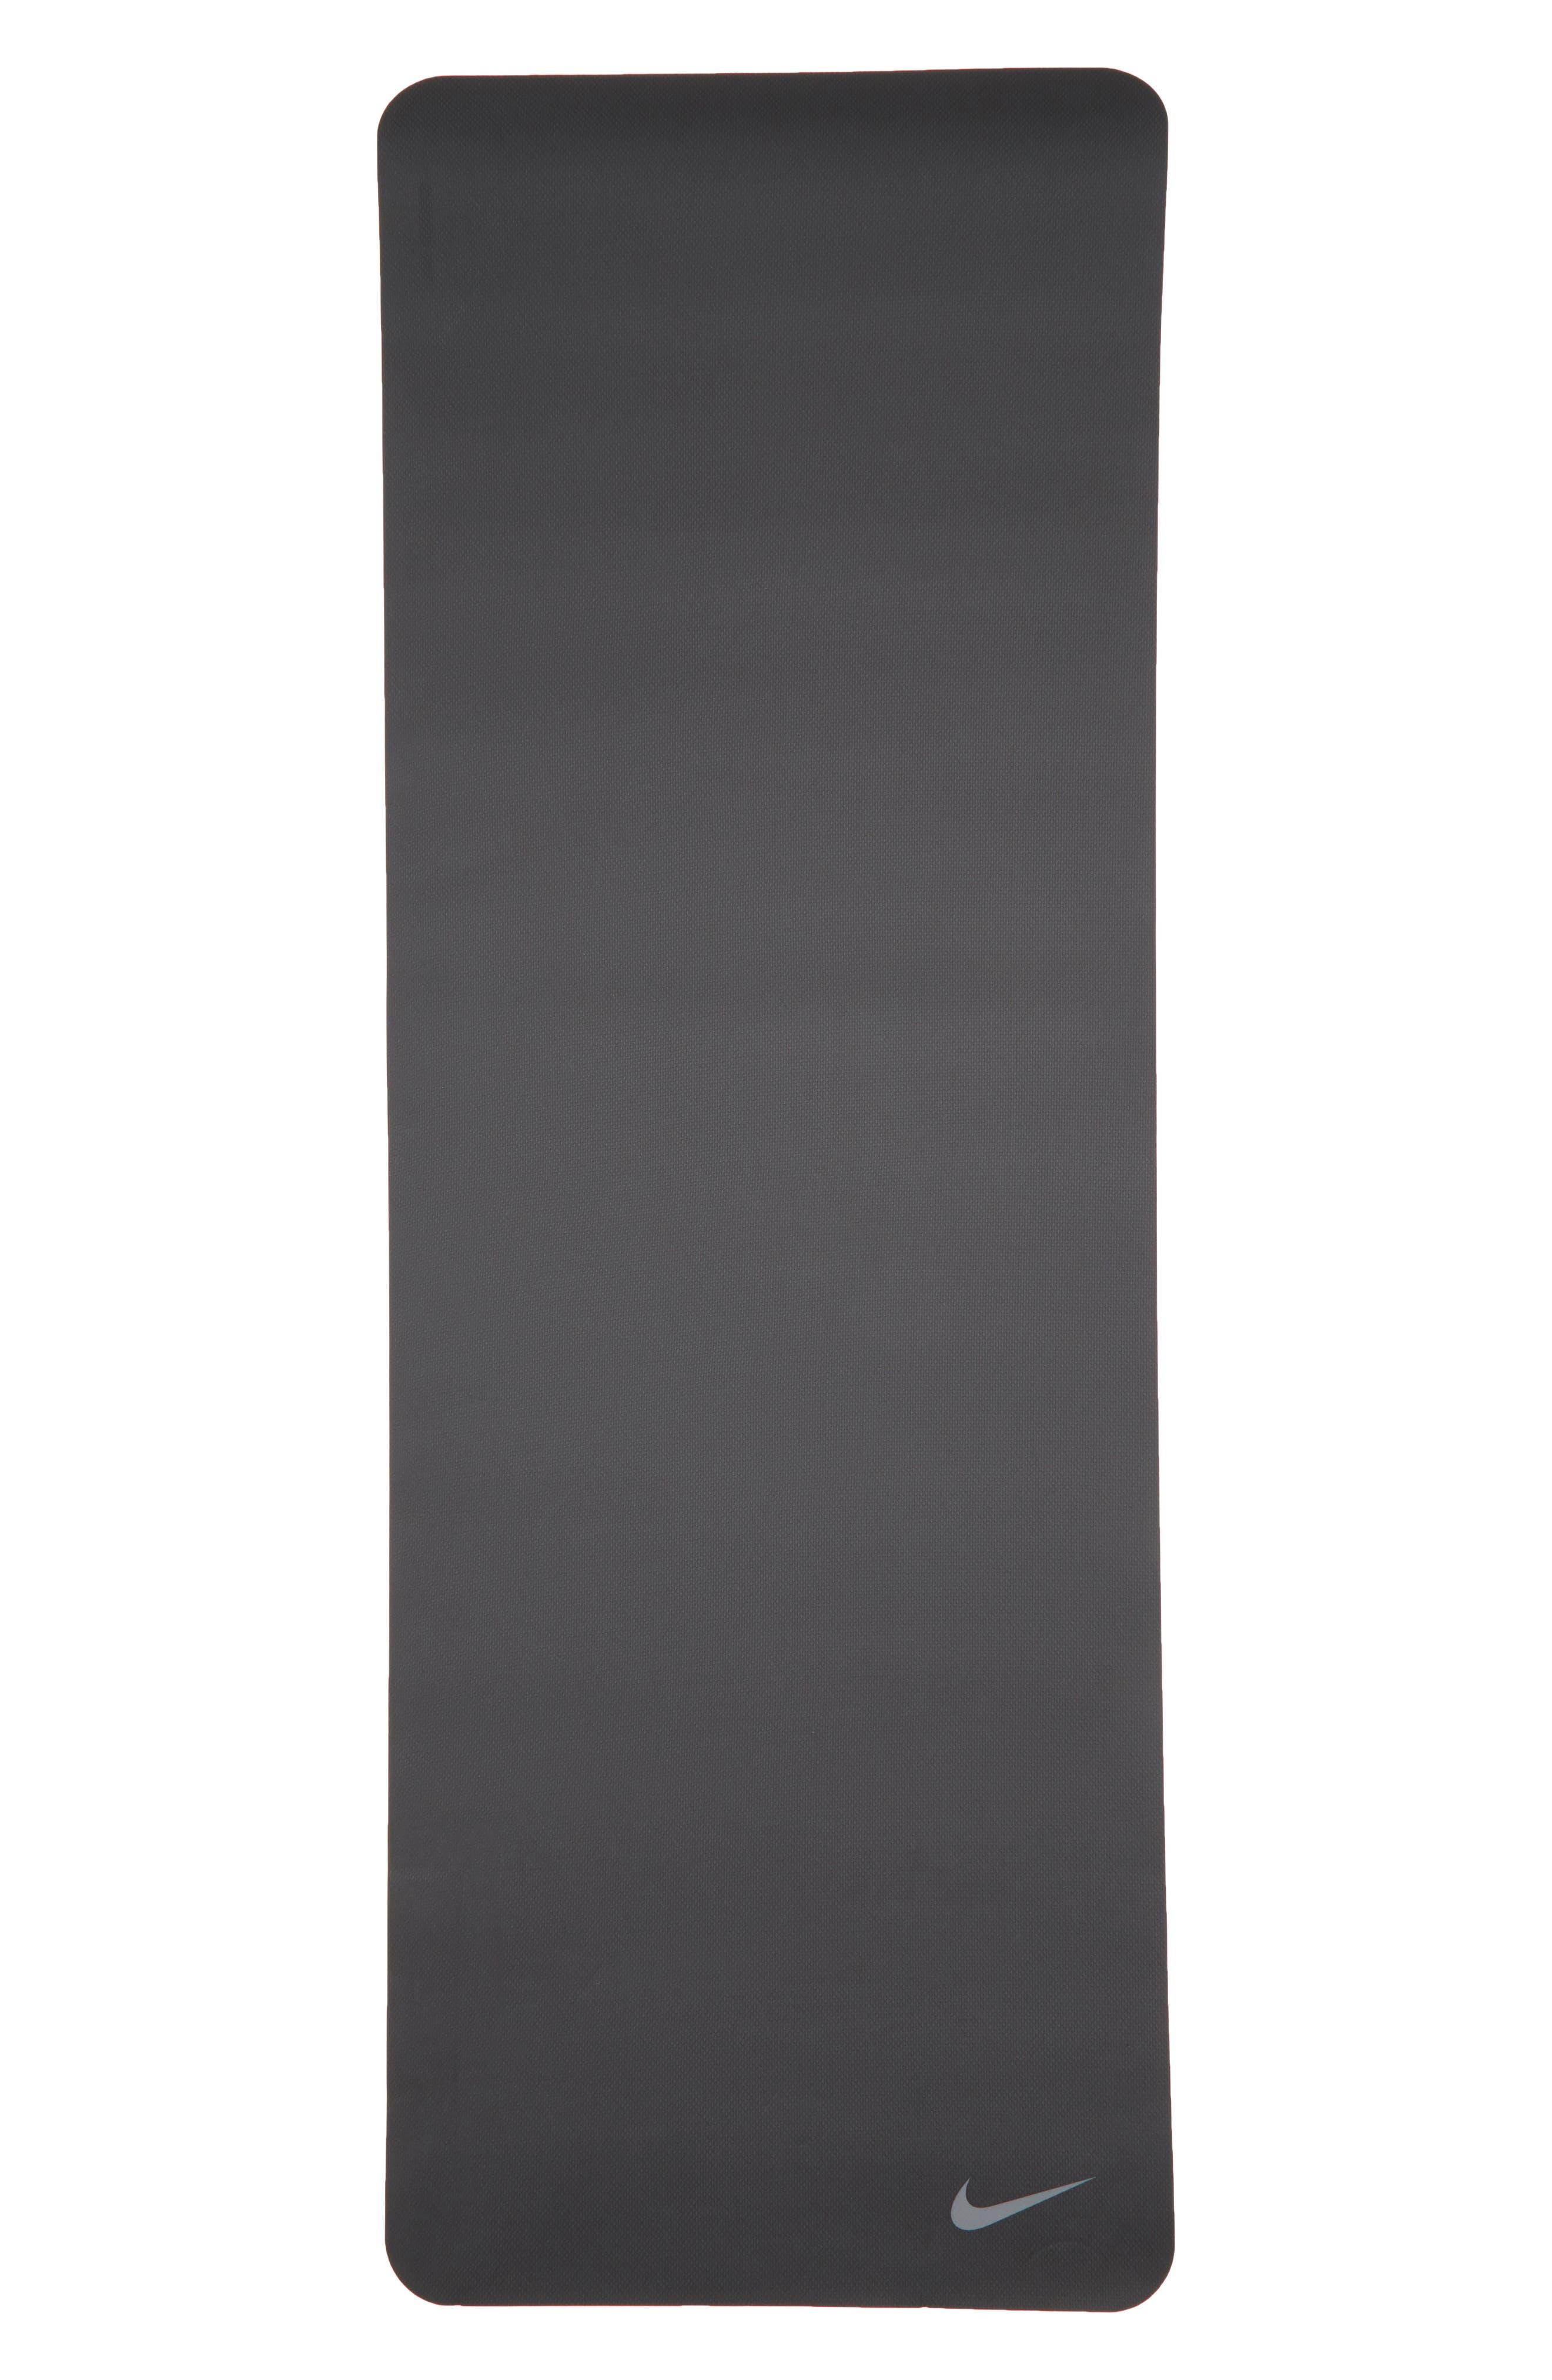 5mm Yoga Mat,                             Alternate thumbnail 2, color,